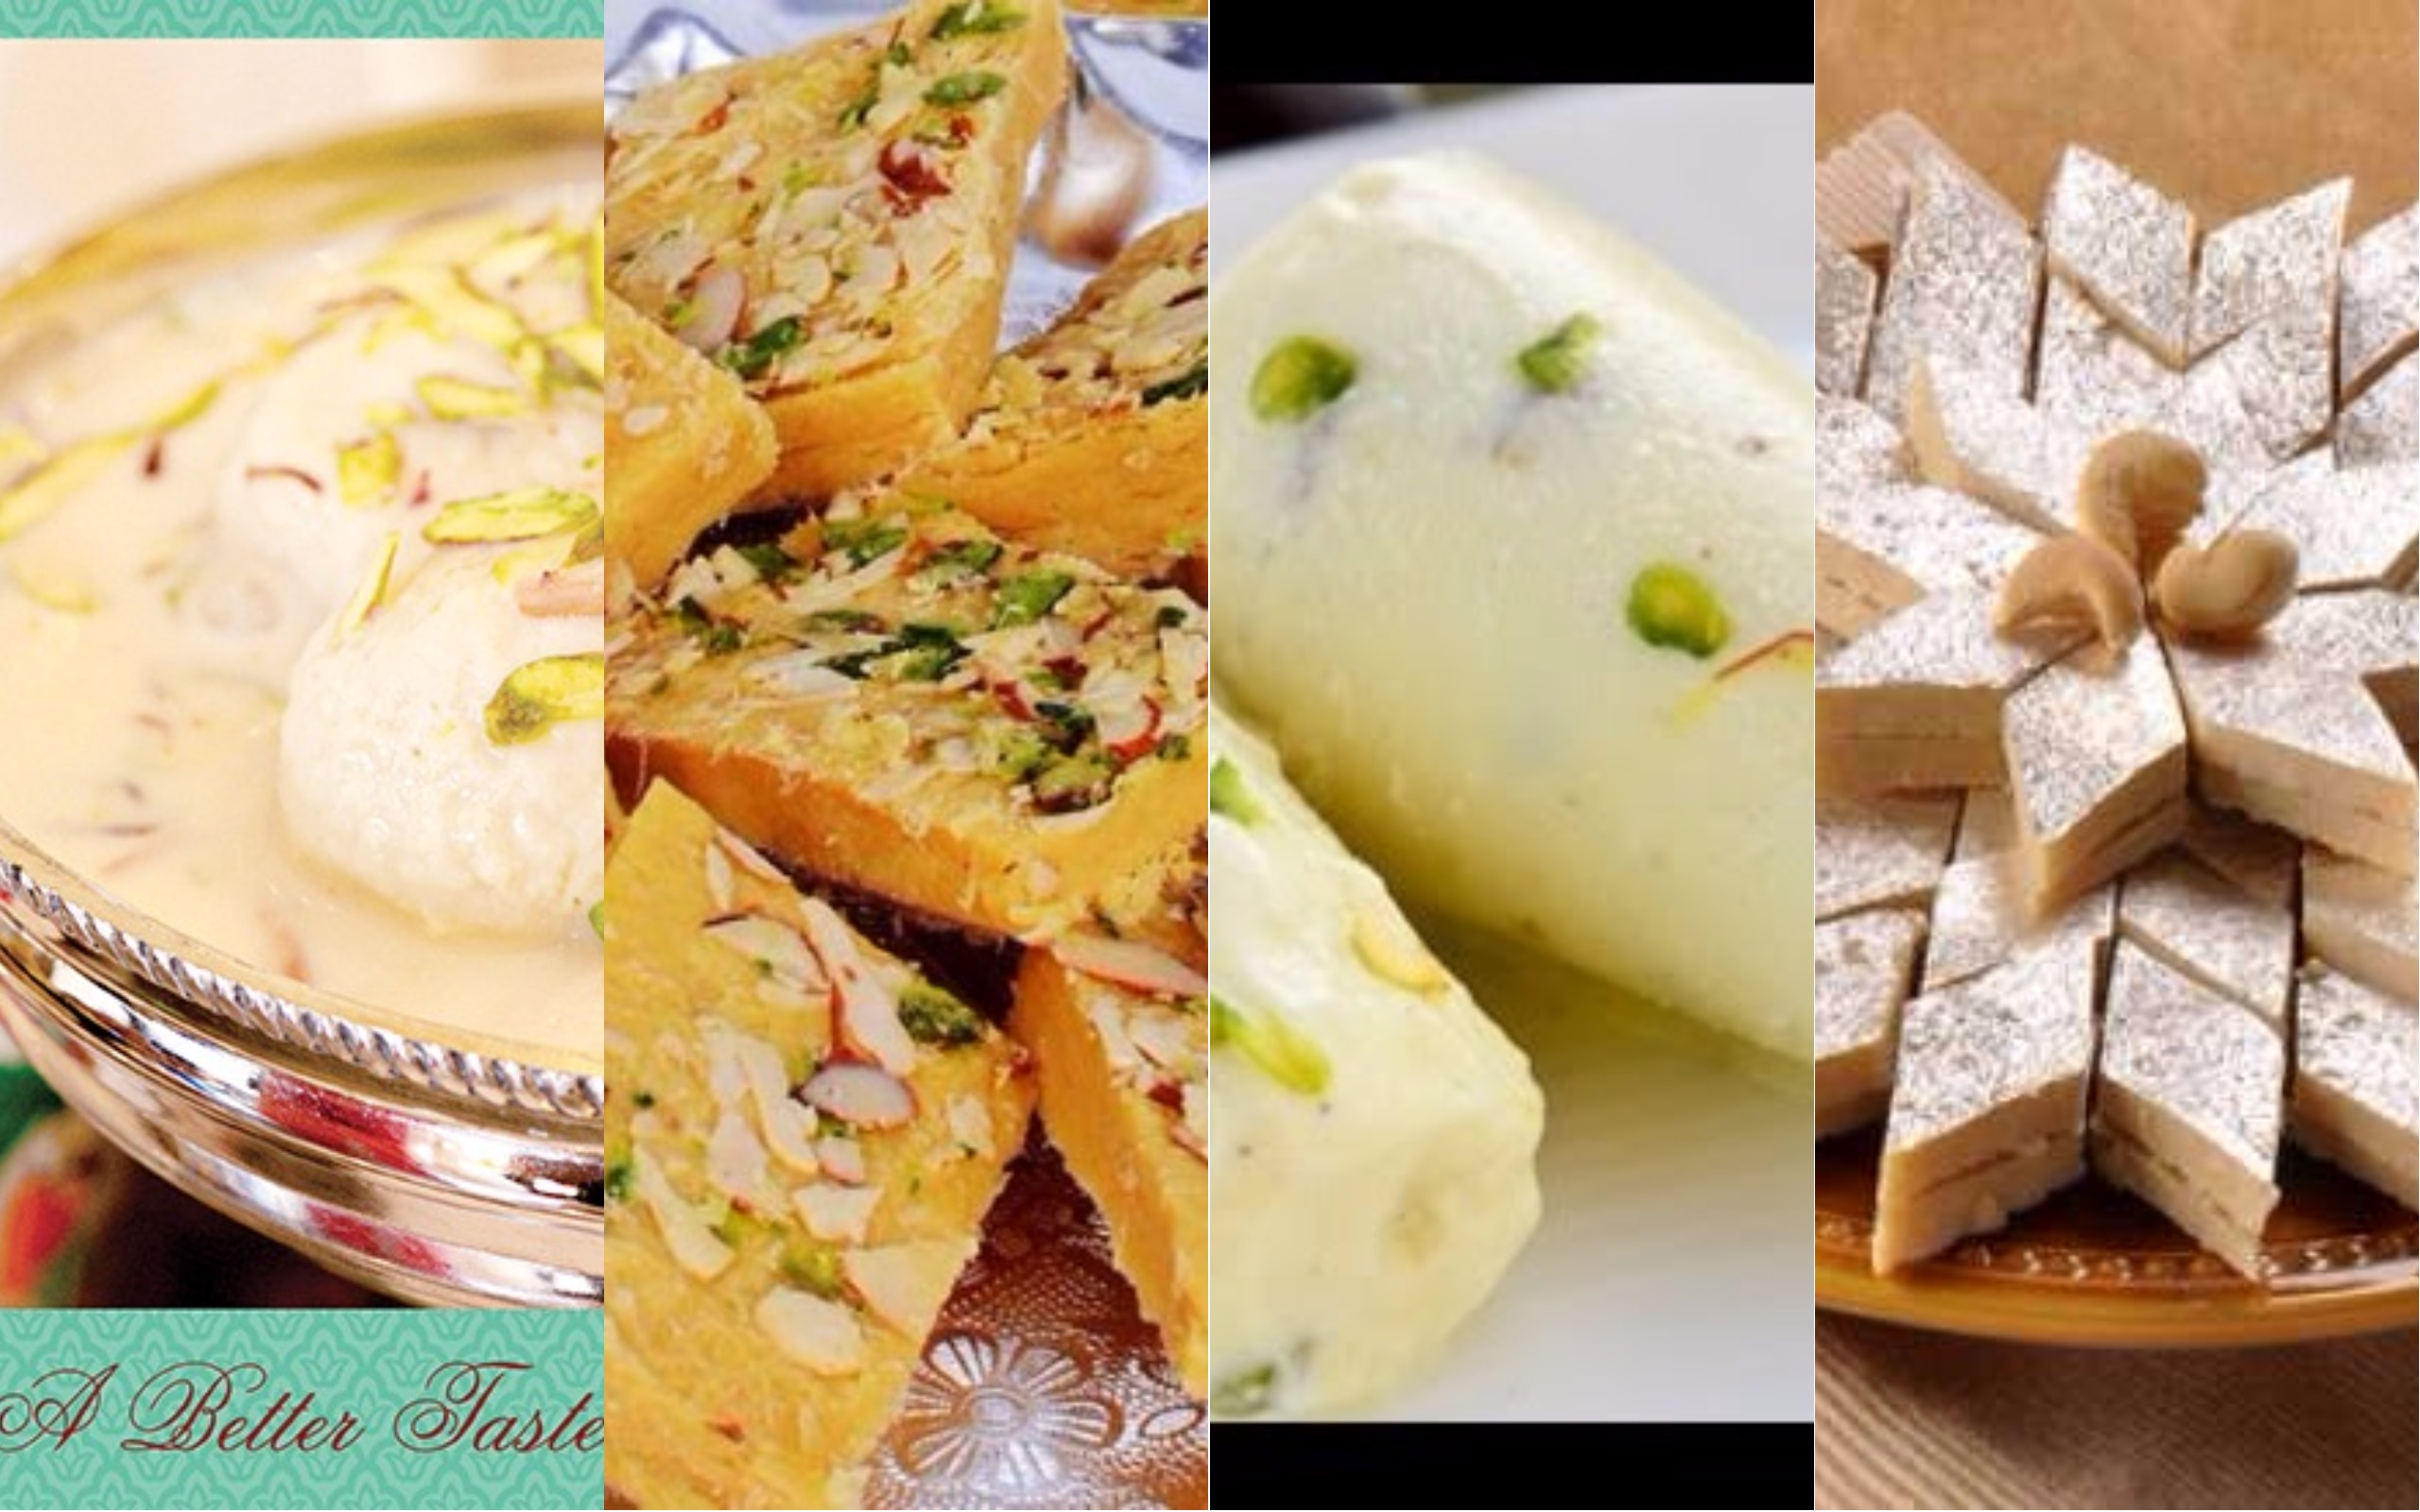 Best Sweet Shops in Lahore